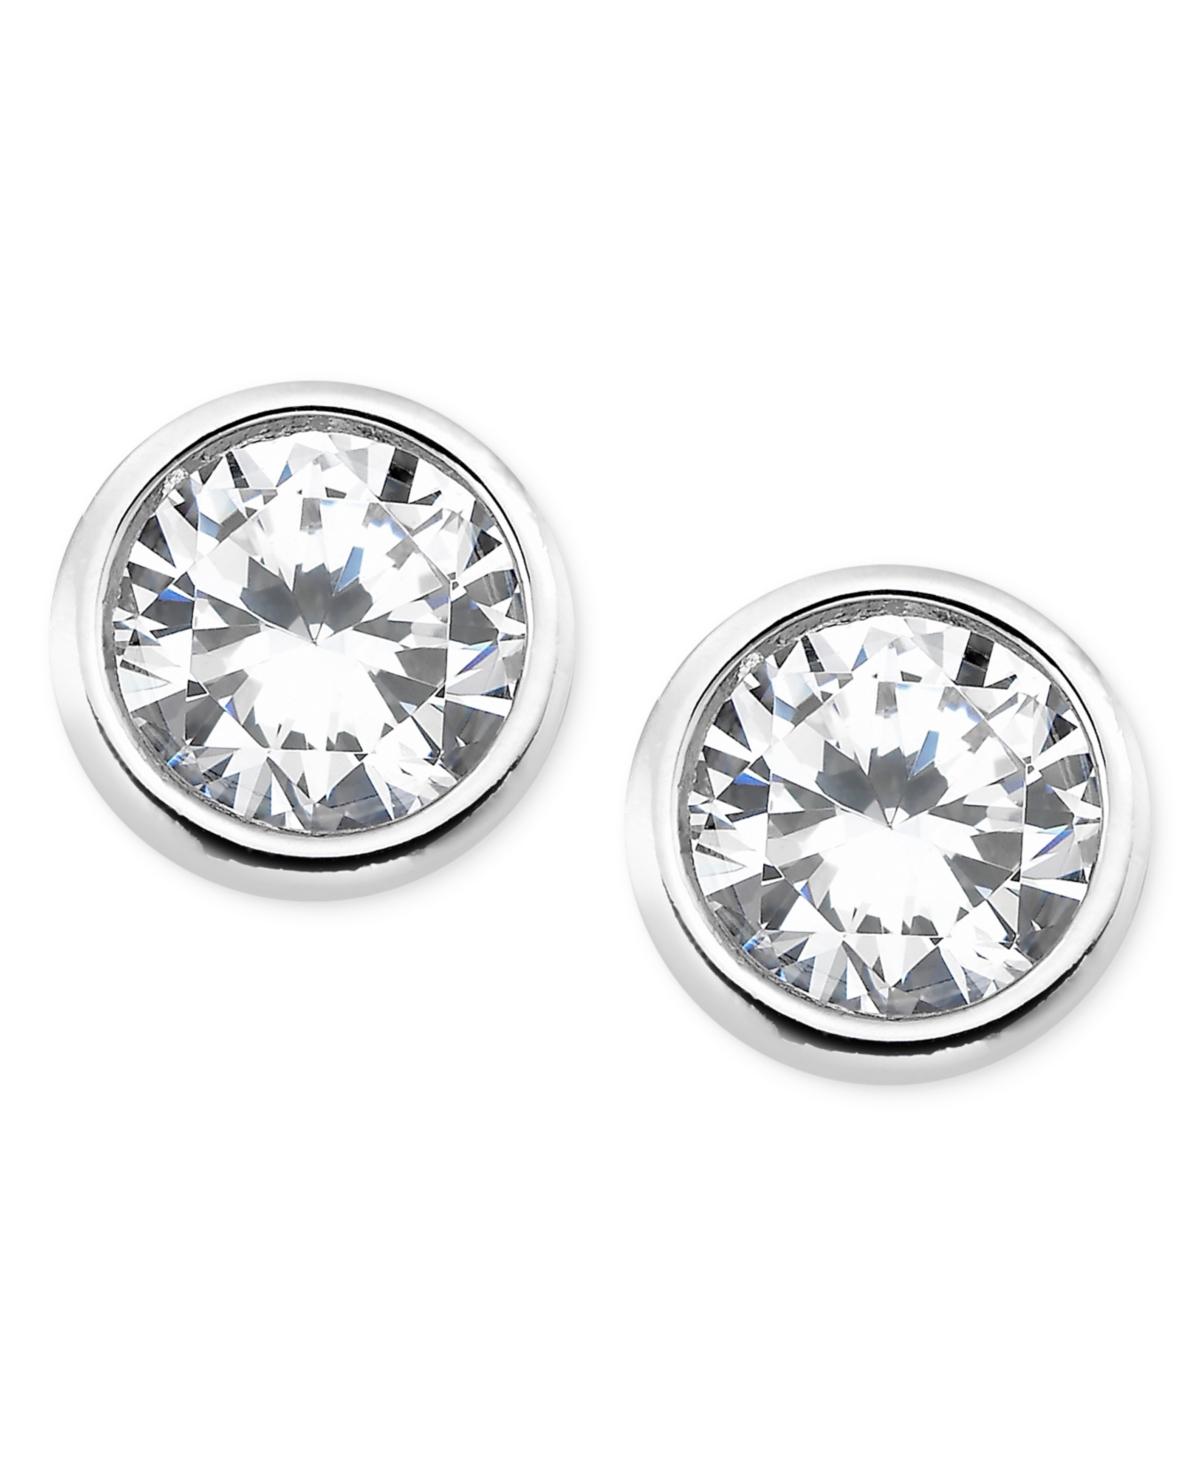 Eliot Danori Stud Crystal Earrings, Created for Macy's